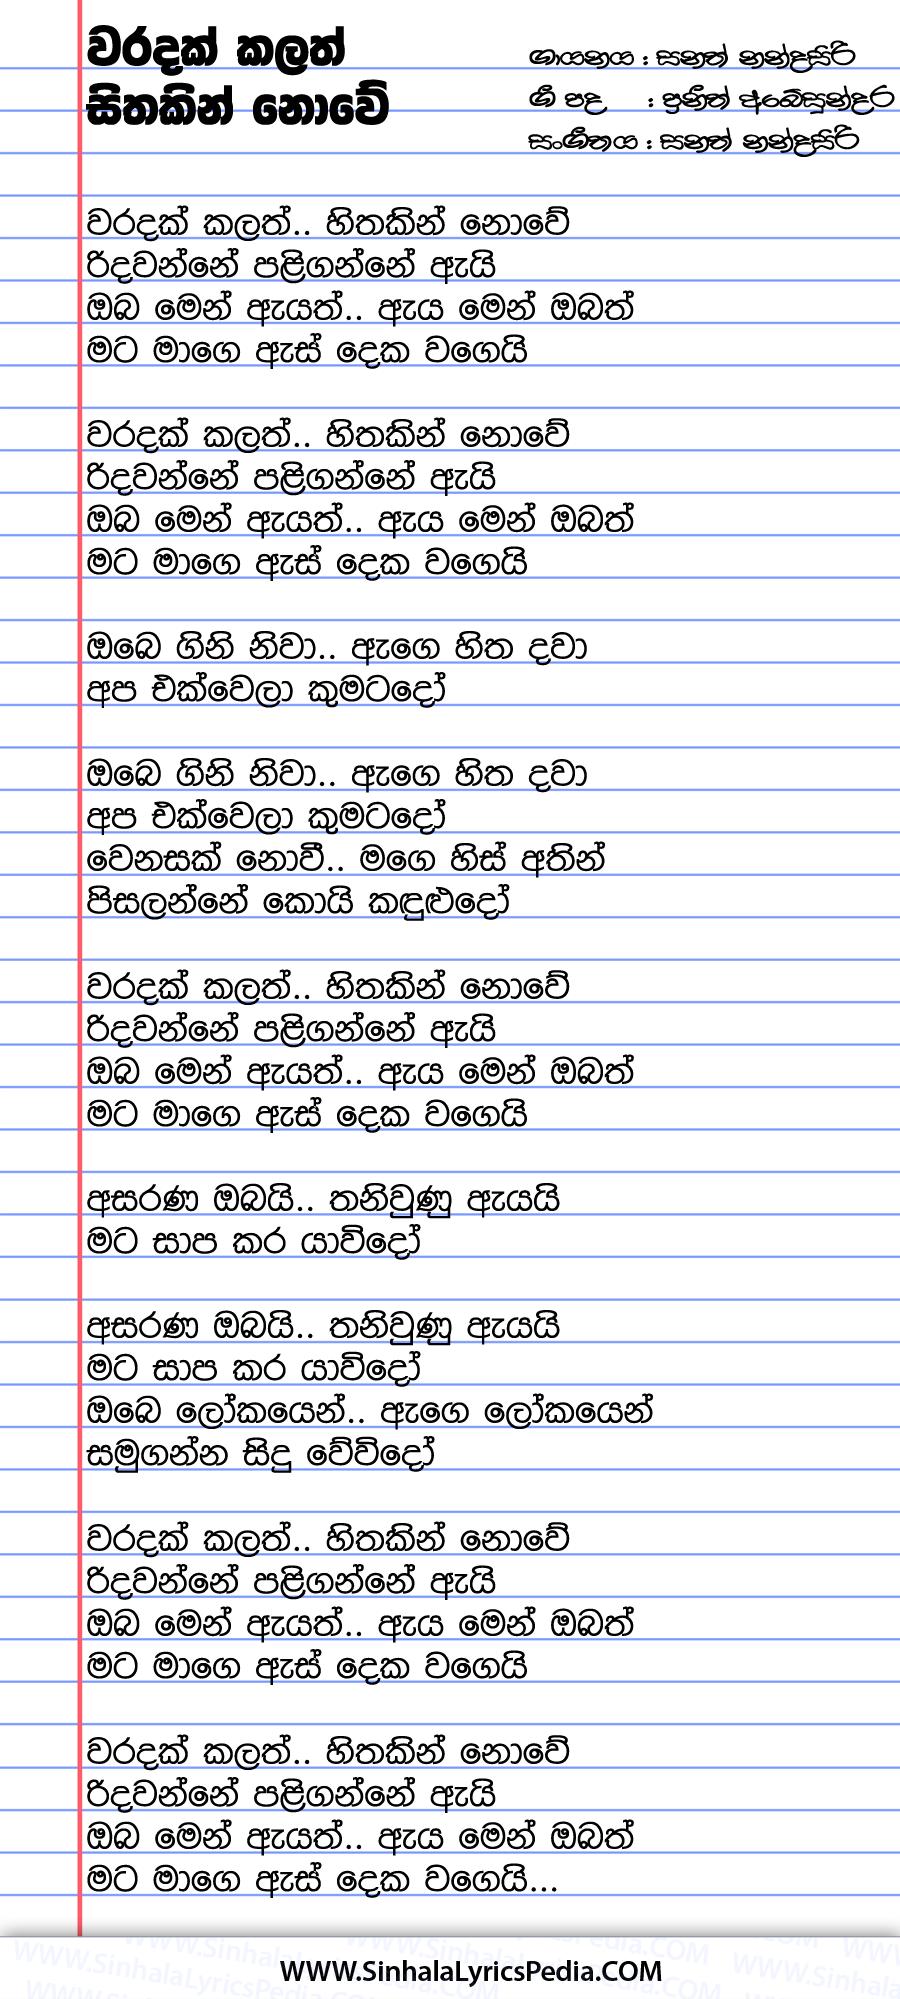 Waradak Kalath Sithakin Nowe Song Lyrics